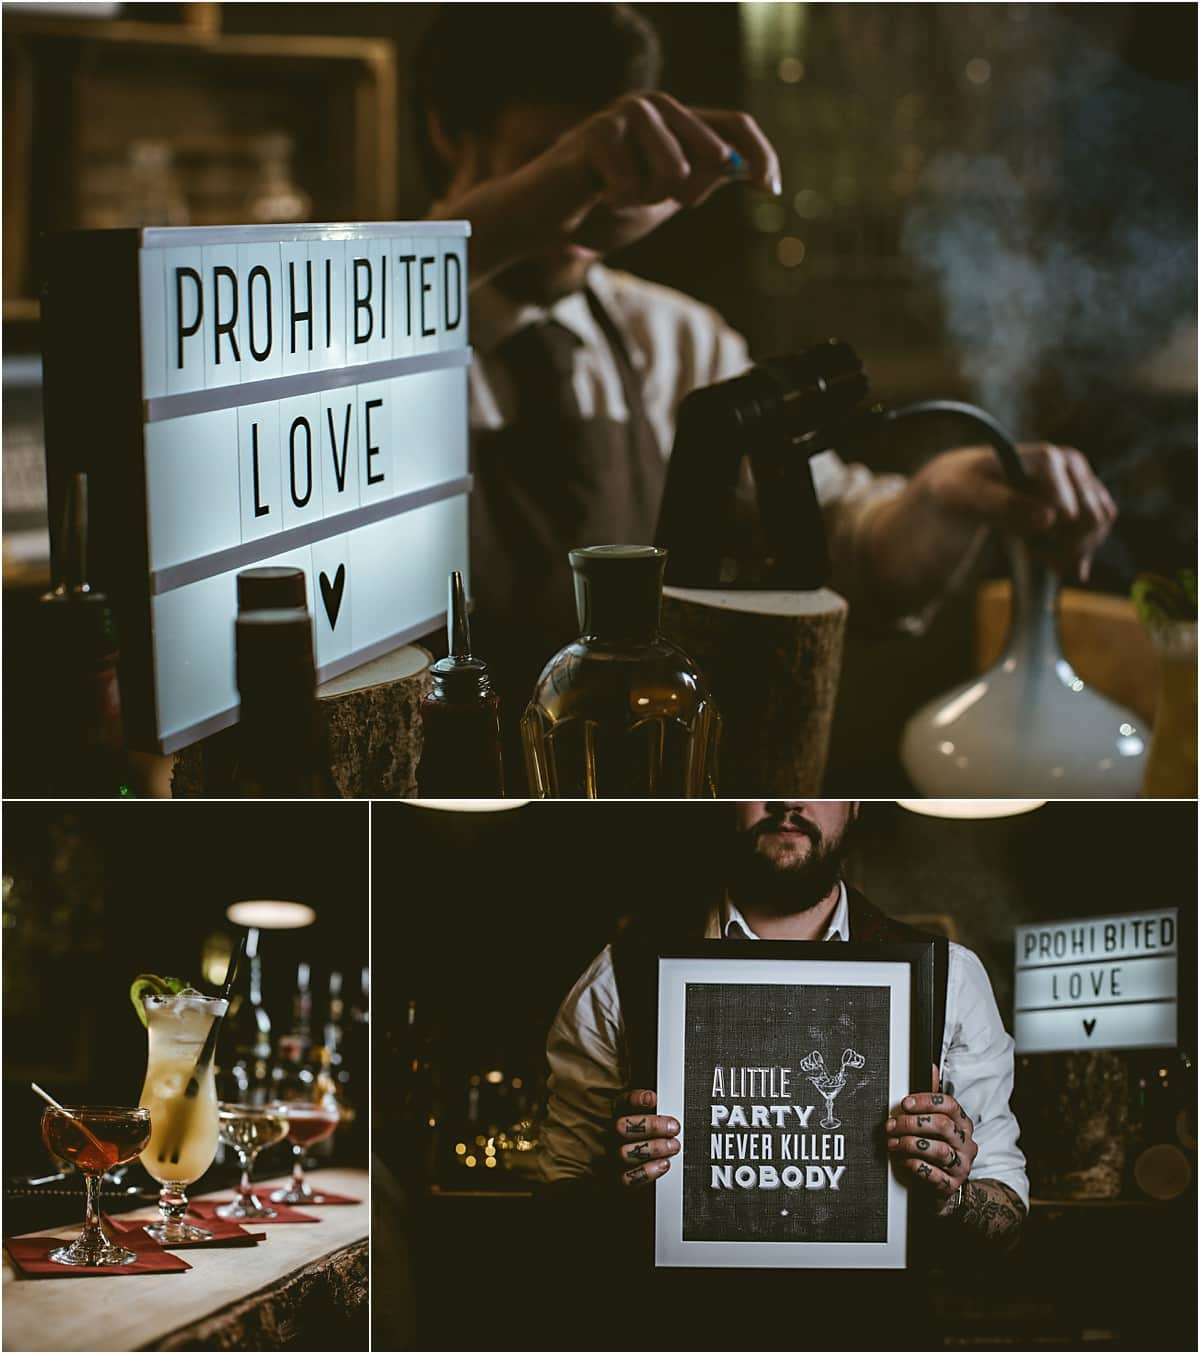 prohibited love wedding details